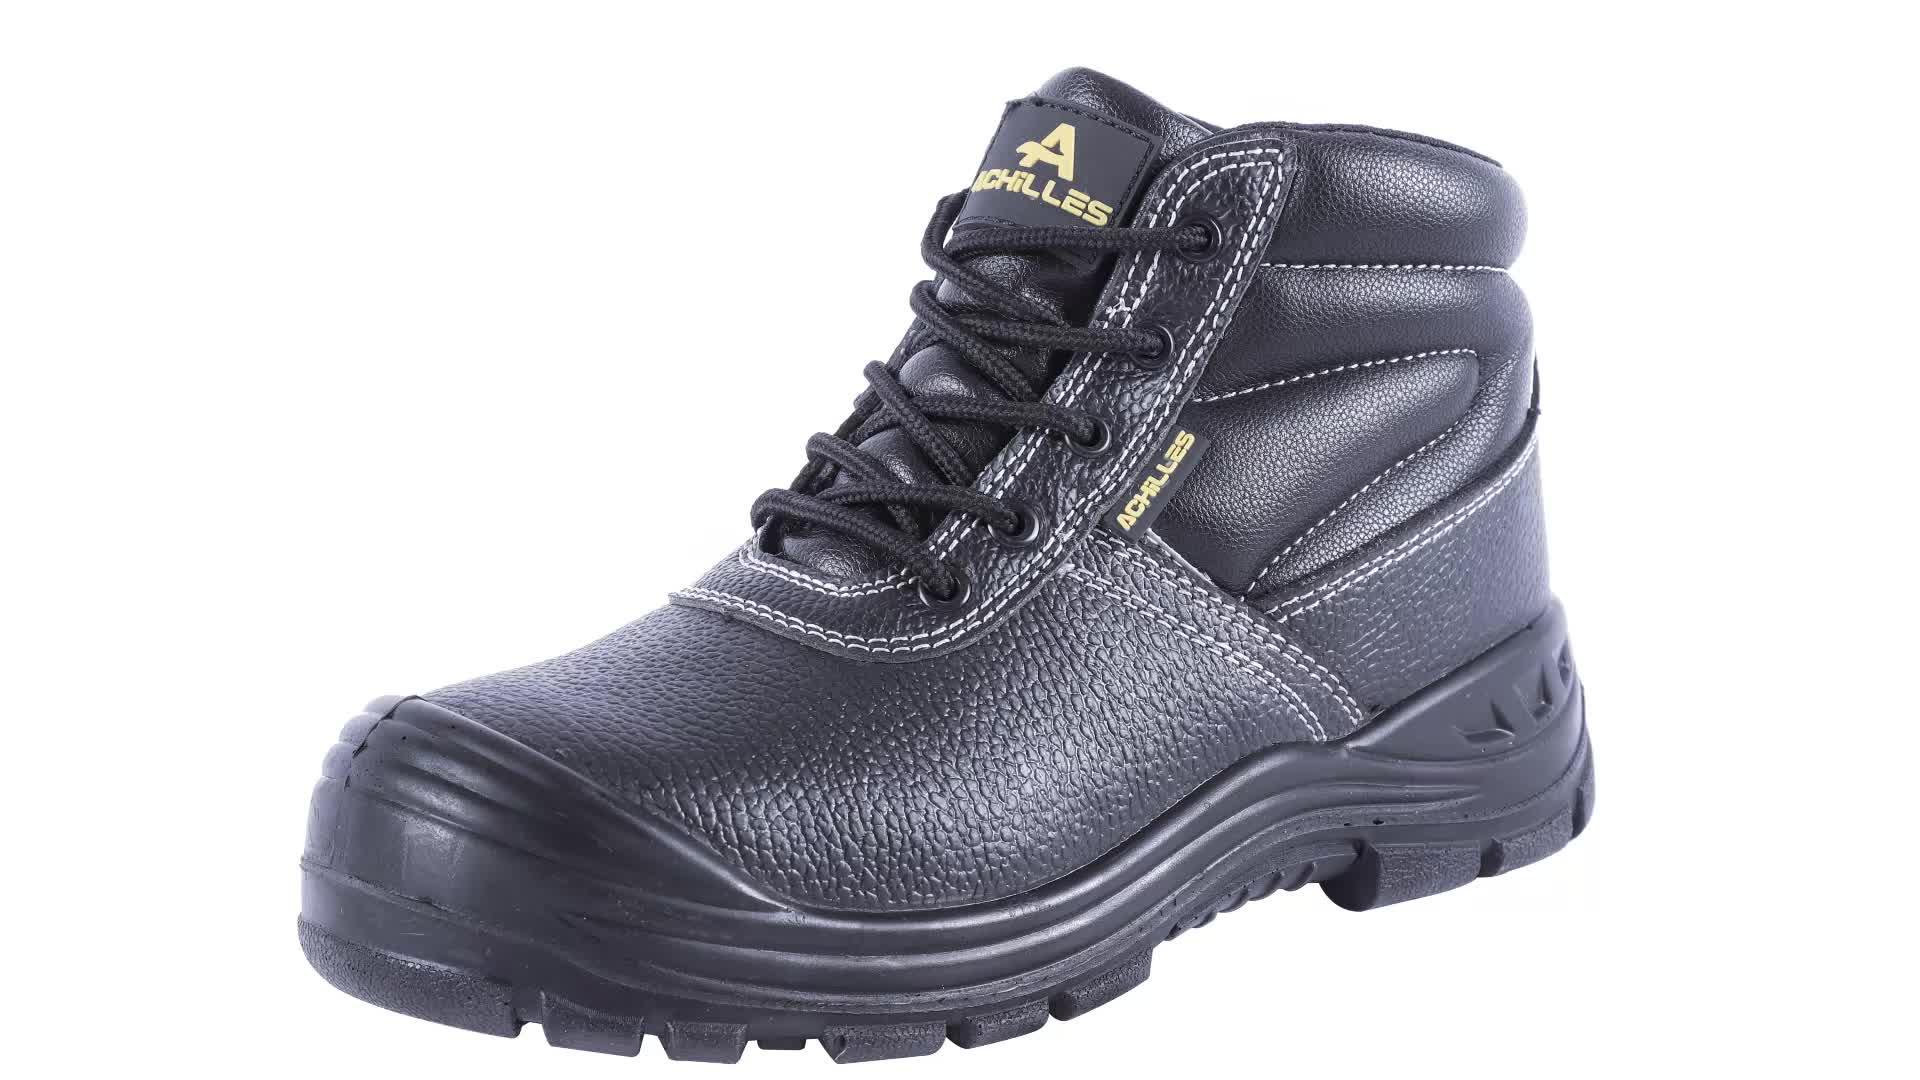 Saudi Arabia Cheap Safety Shoes Price